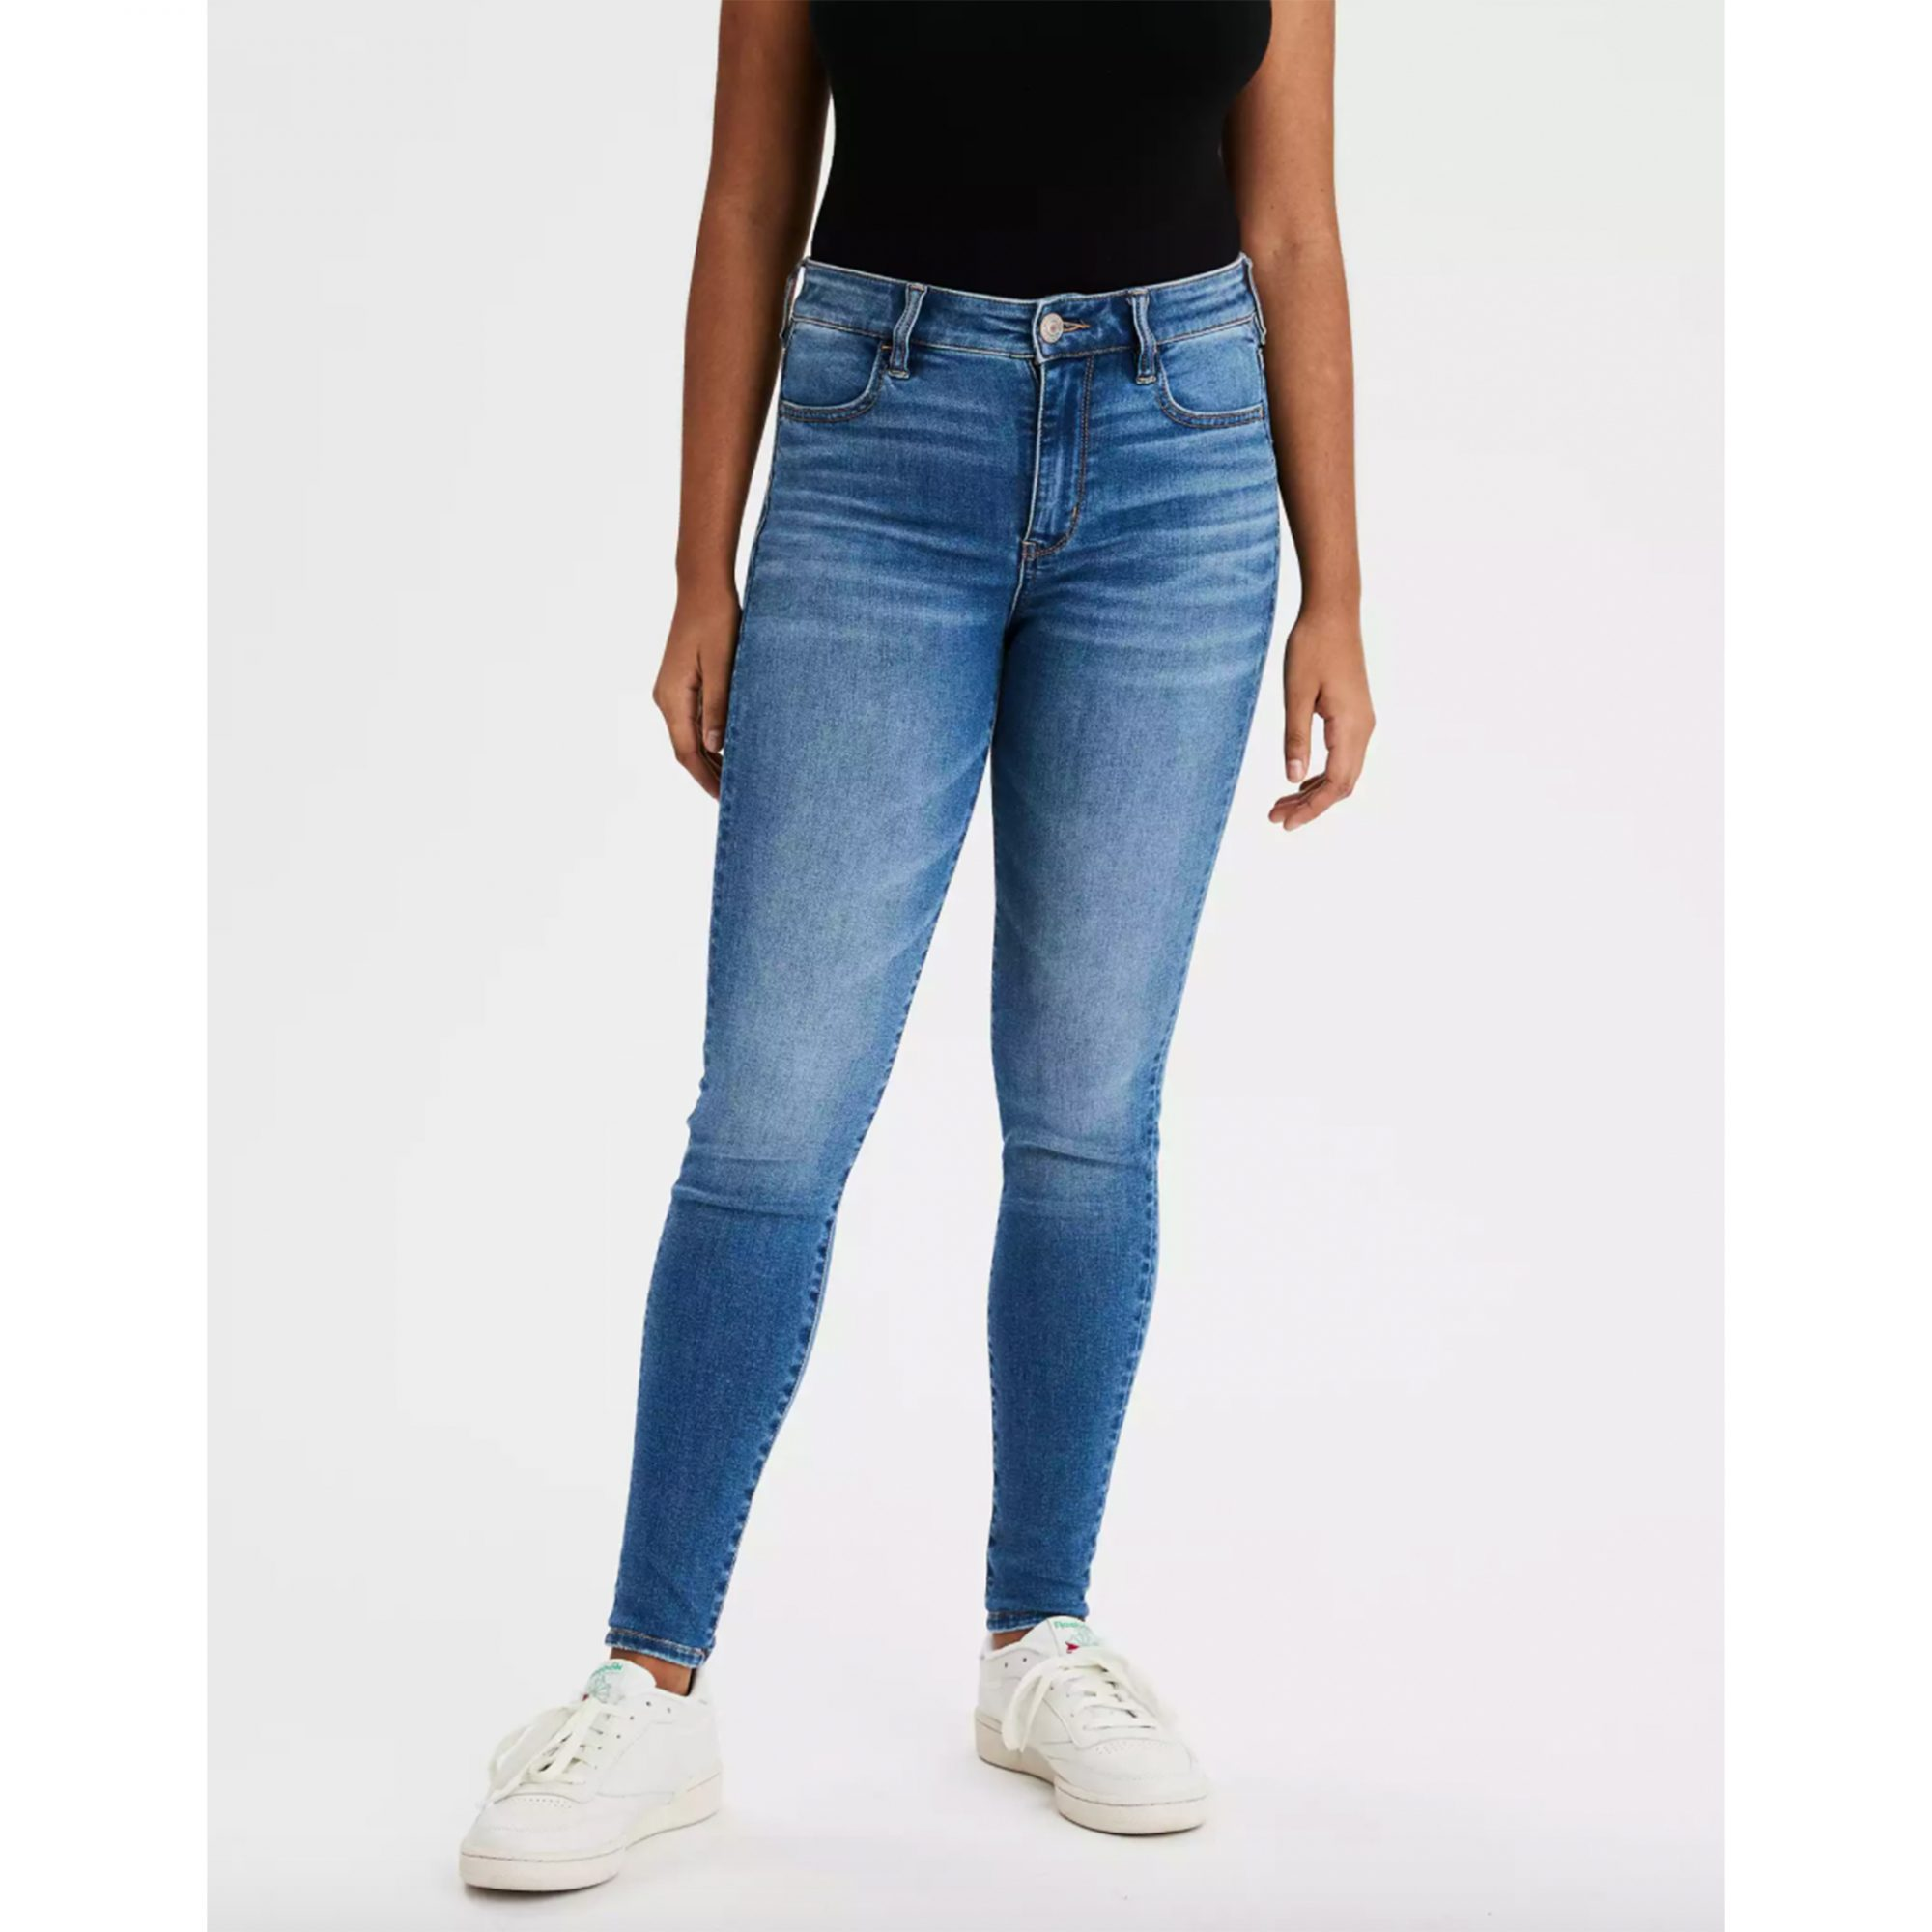 american-eagle-jeggings, best-jeans-for-women